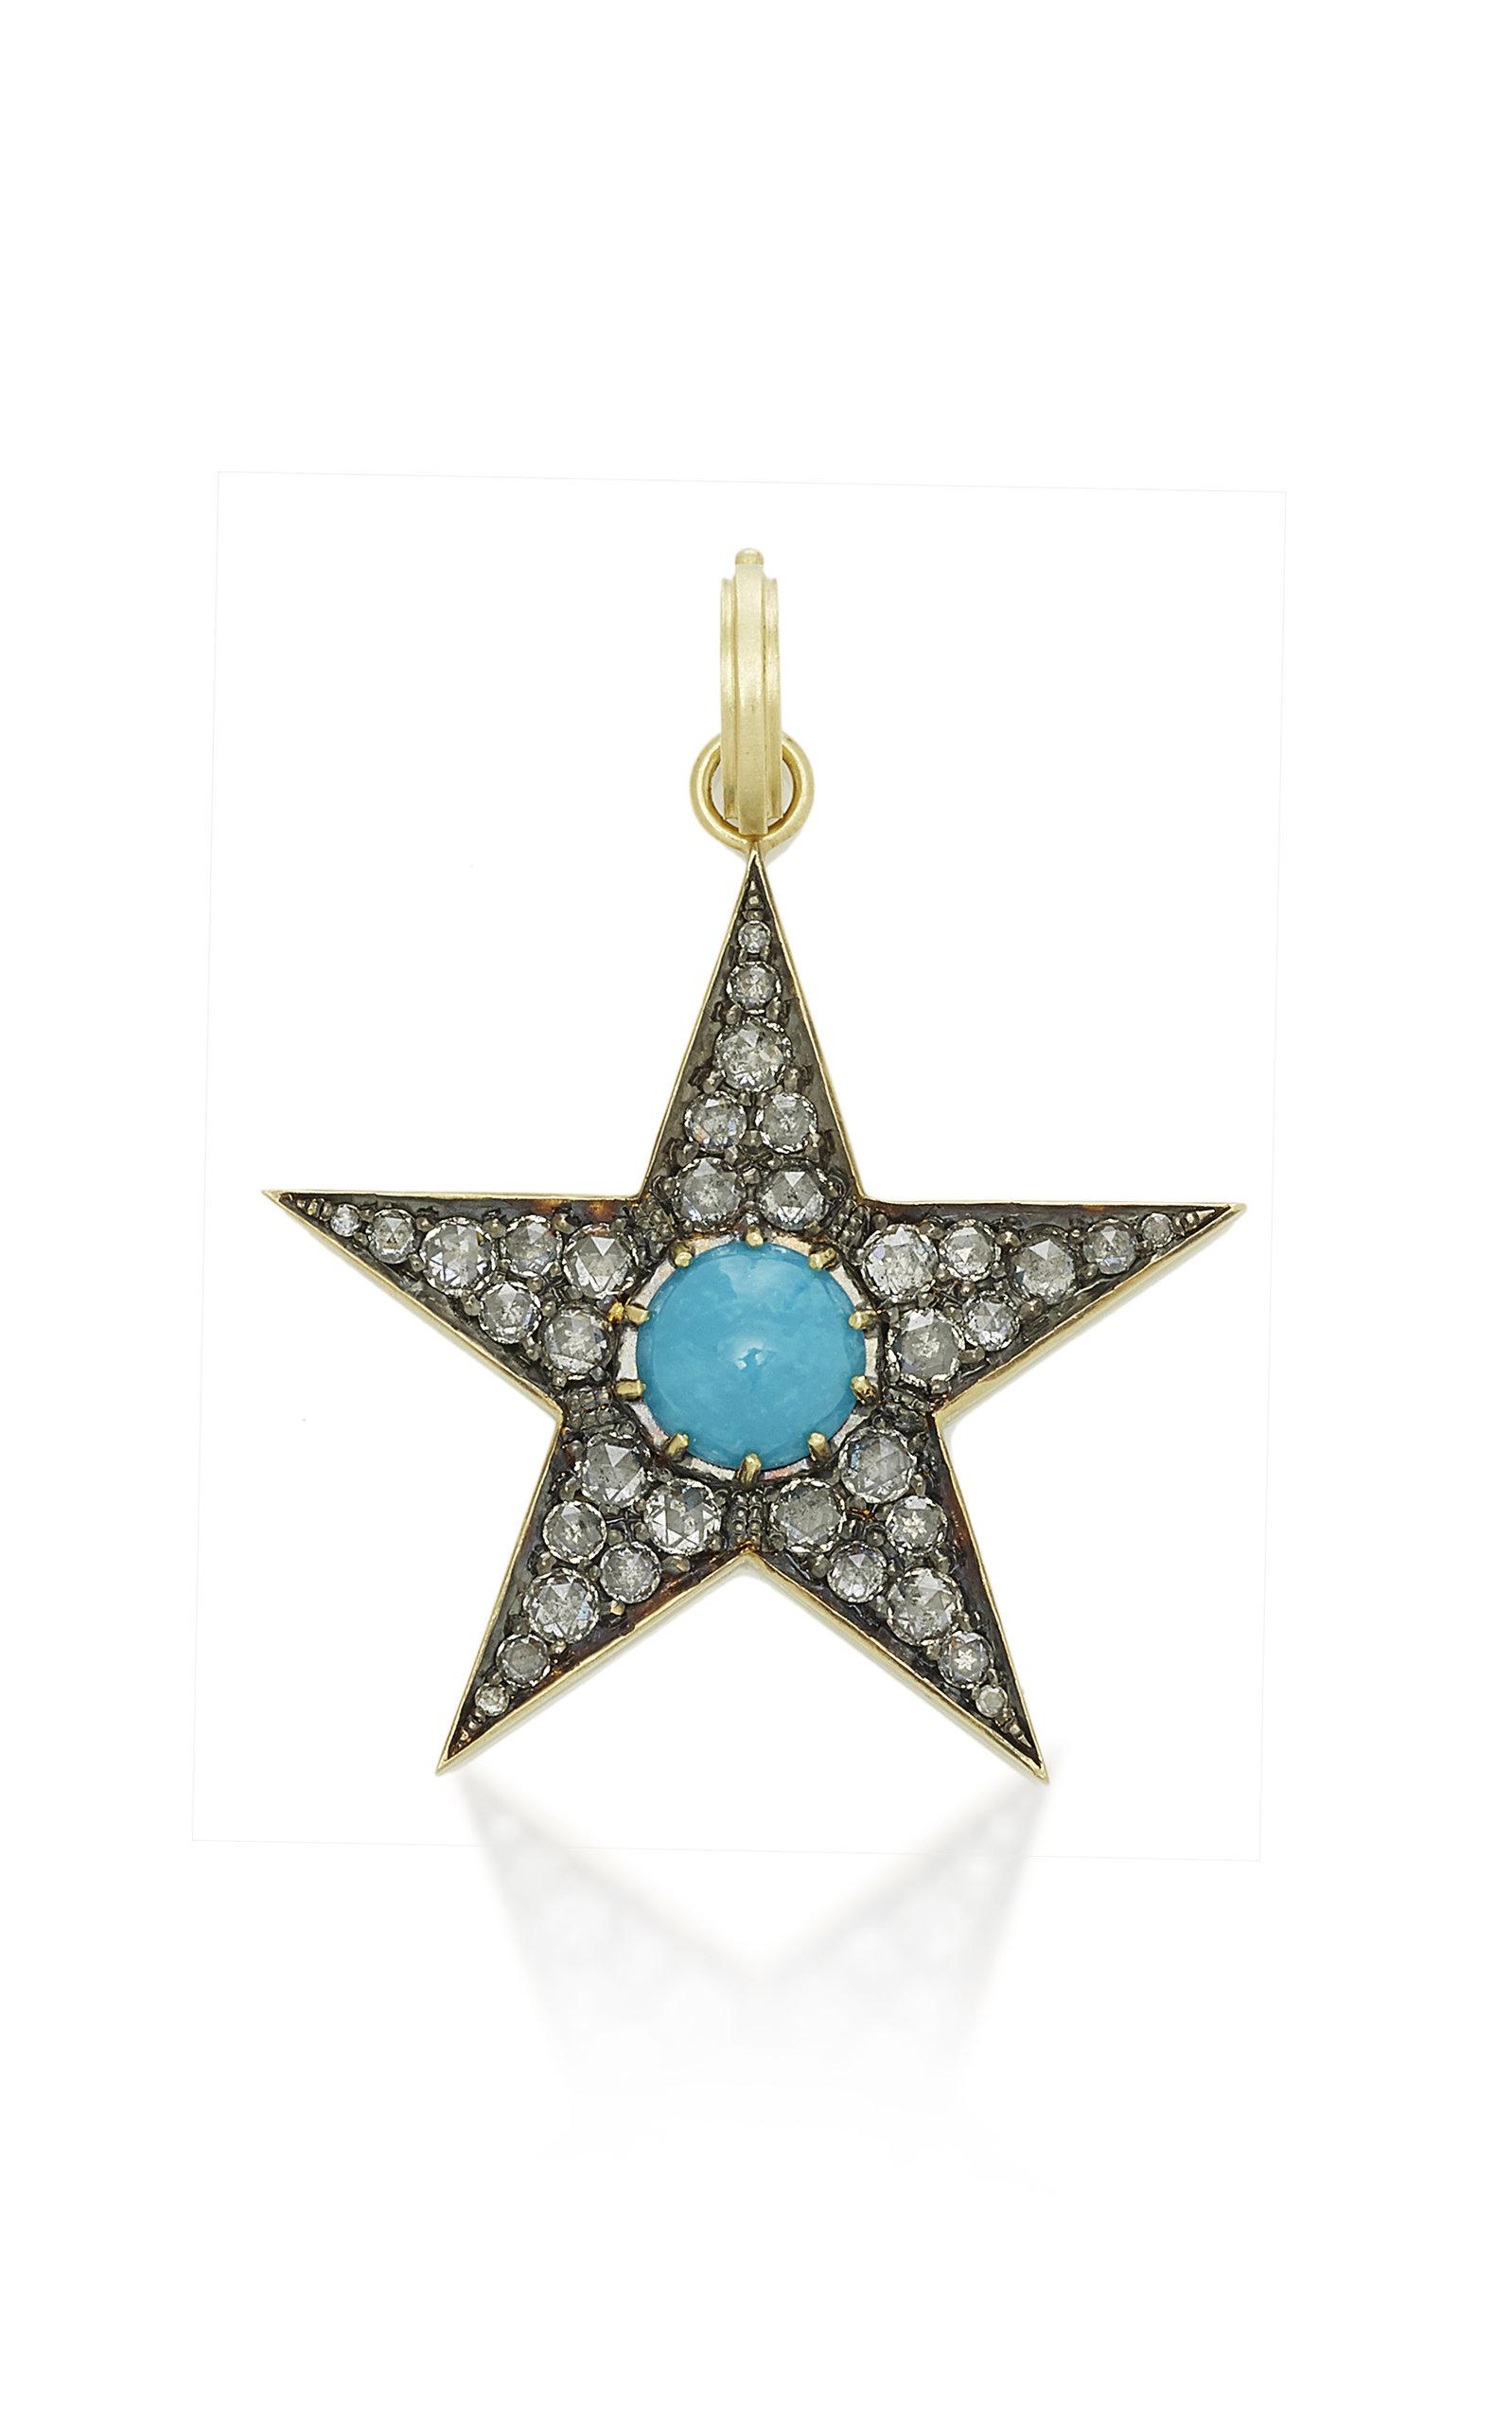 SYLVA & CIE LARGE TURQUOISE AND DIAMOND STAR PENDANT